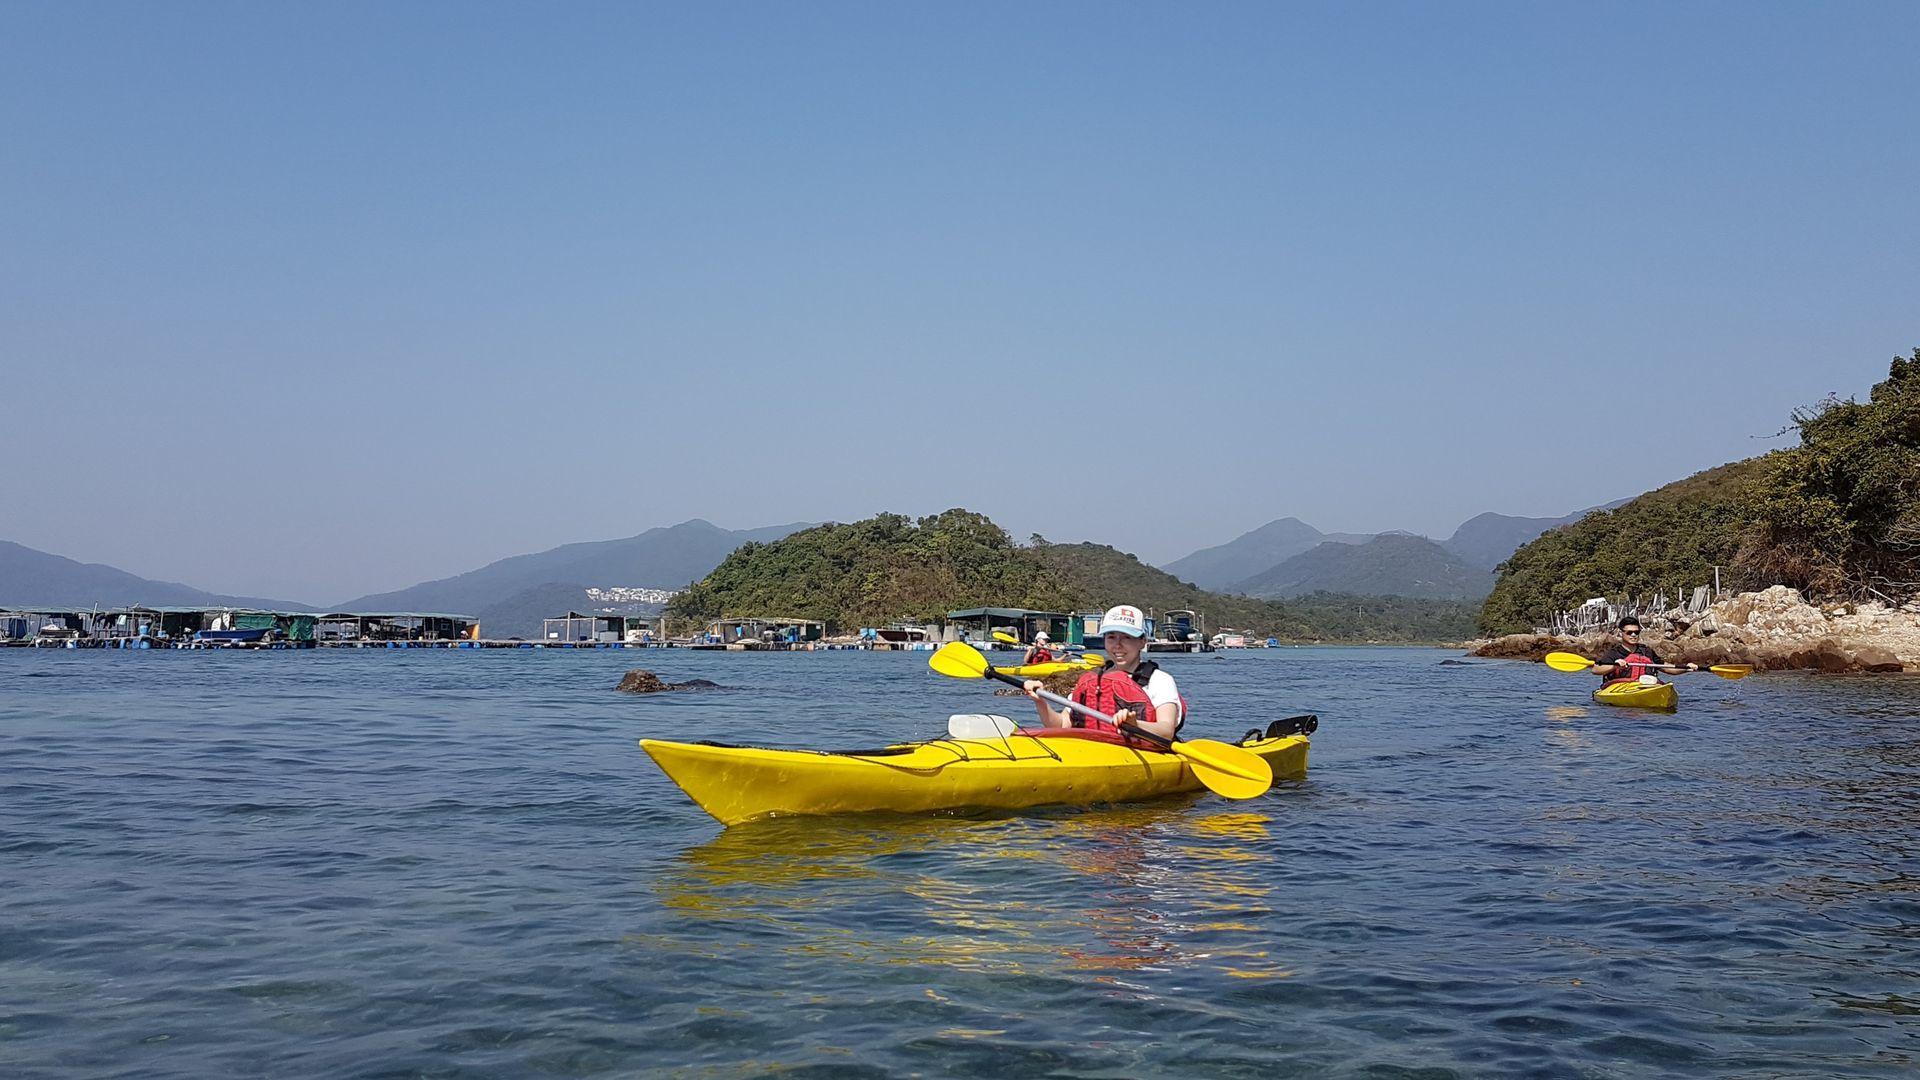 24 Jan 2019 UNESCO Geopark 1 day sea kayak trip Hong Kong